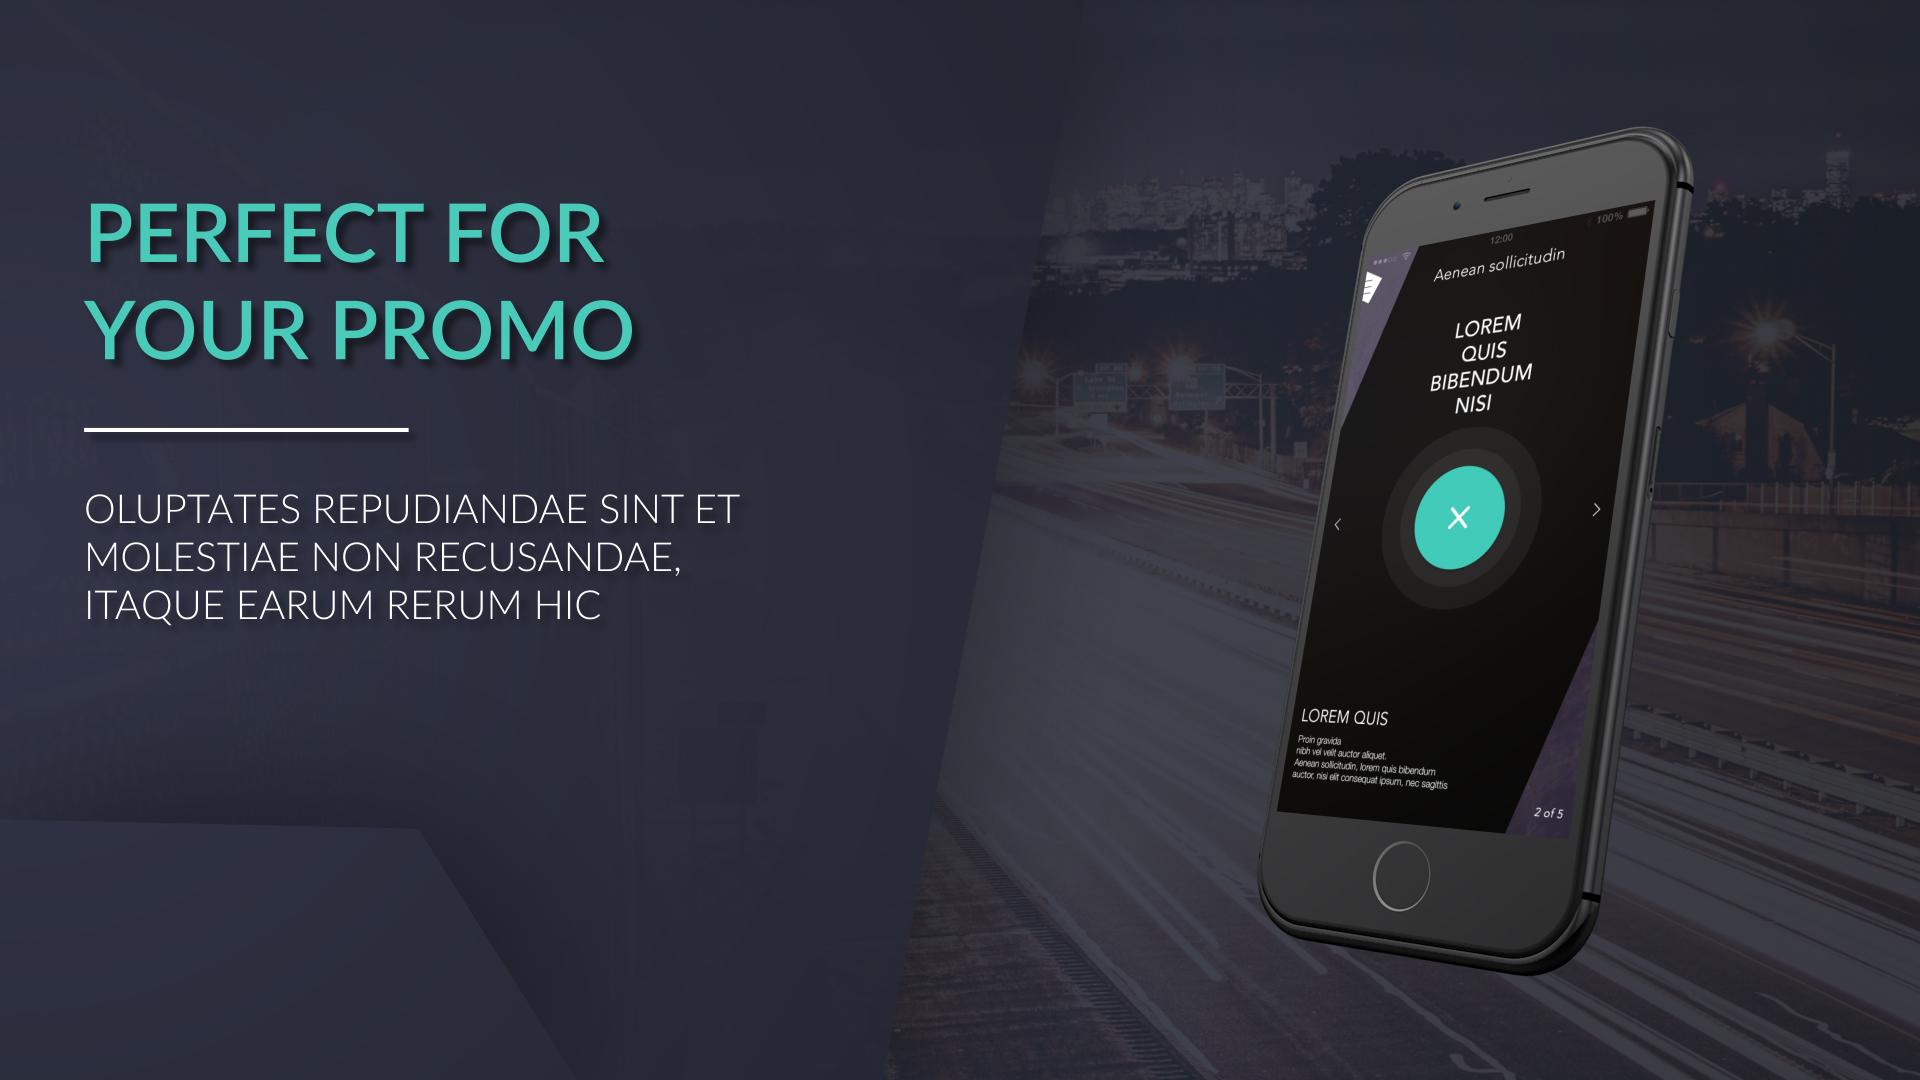 iphone web app promo mobile after effects templates f5. Black Bedroom Furniture Sets. Home Design Ideas